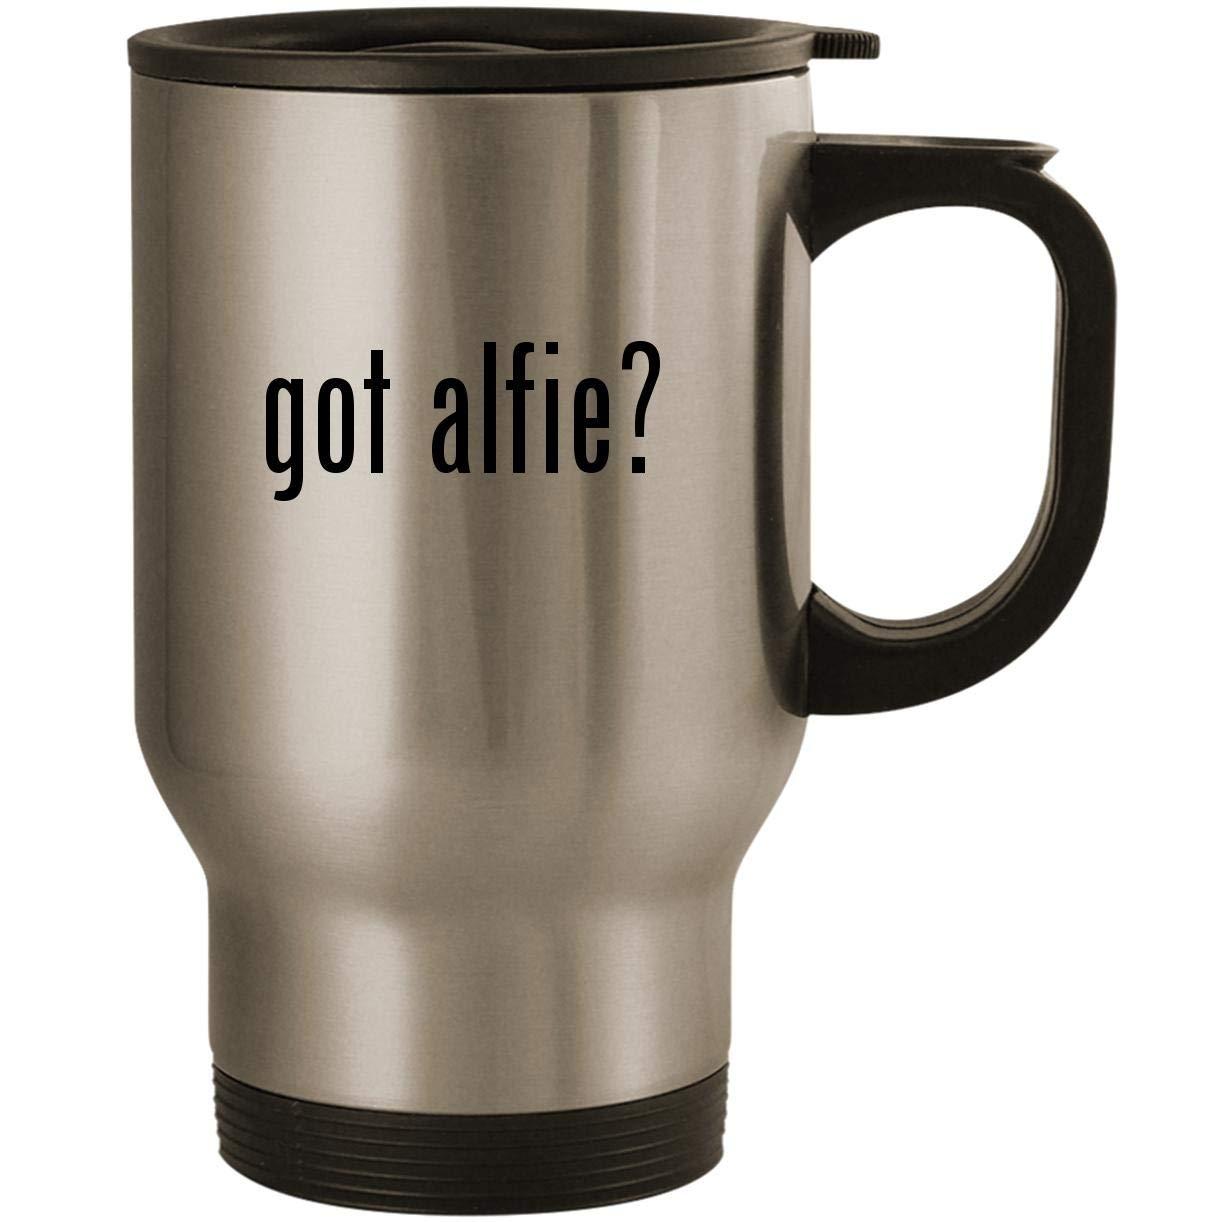 got alfie? - Stainless Steel 14oz Road Ready Travel Mug, Silver